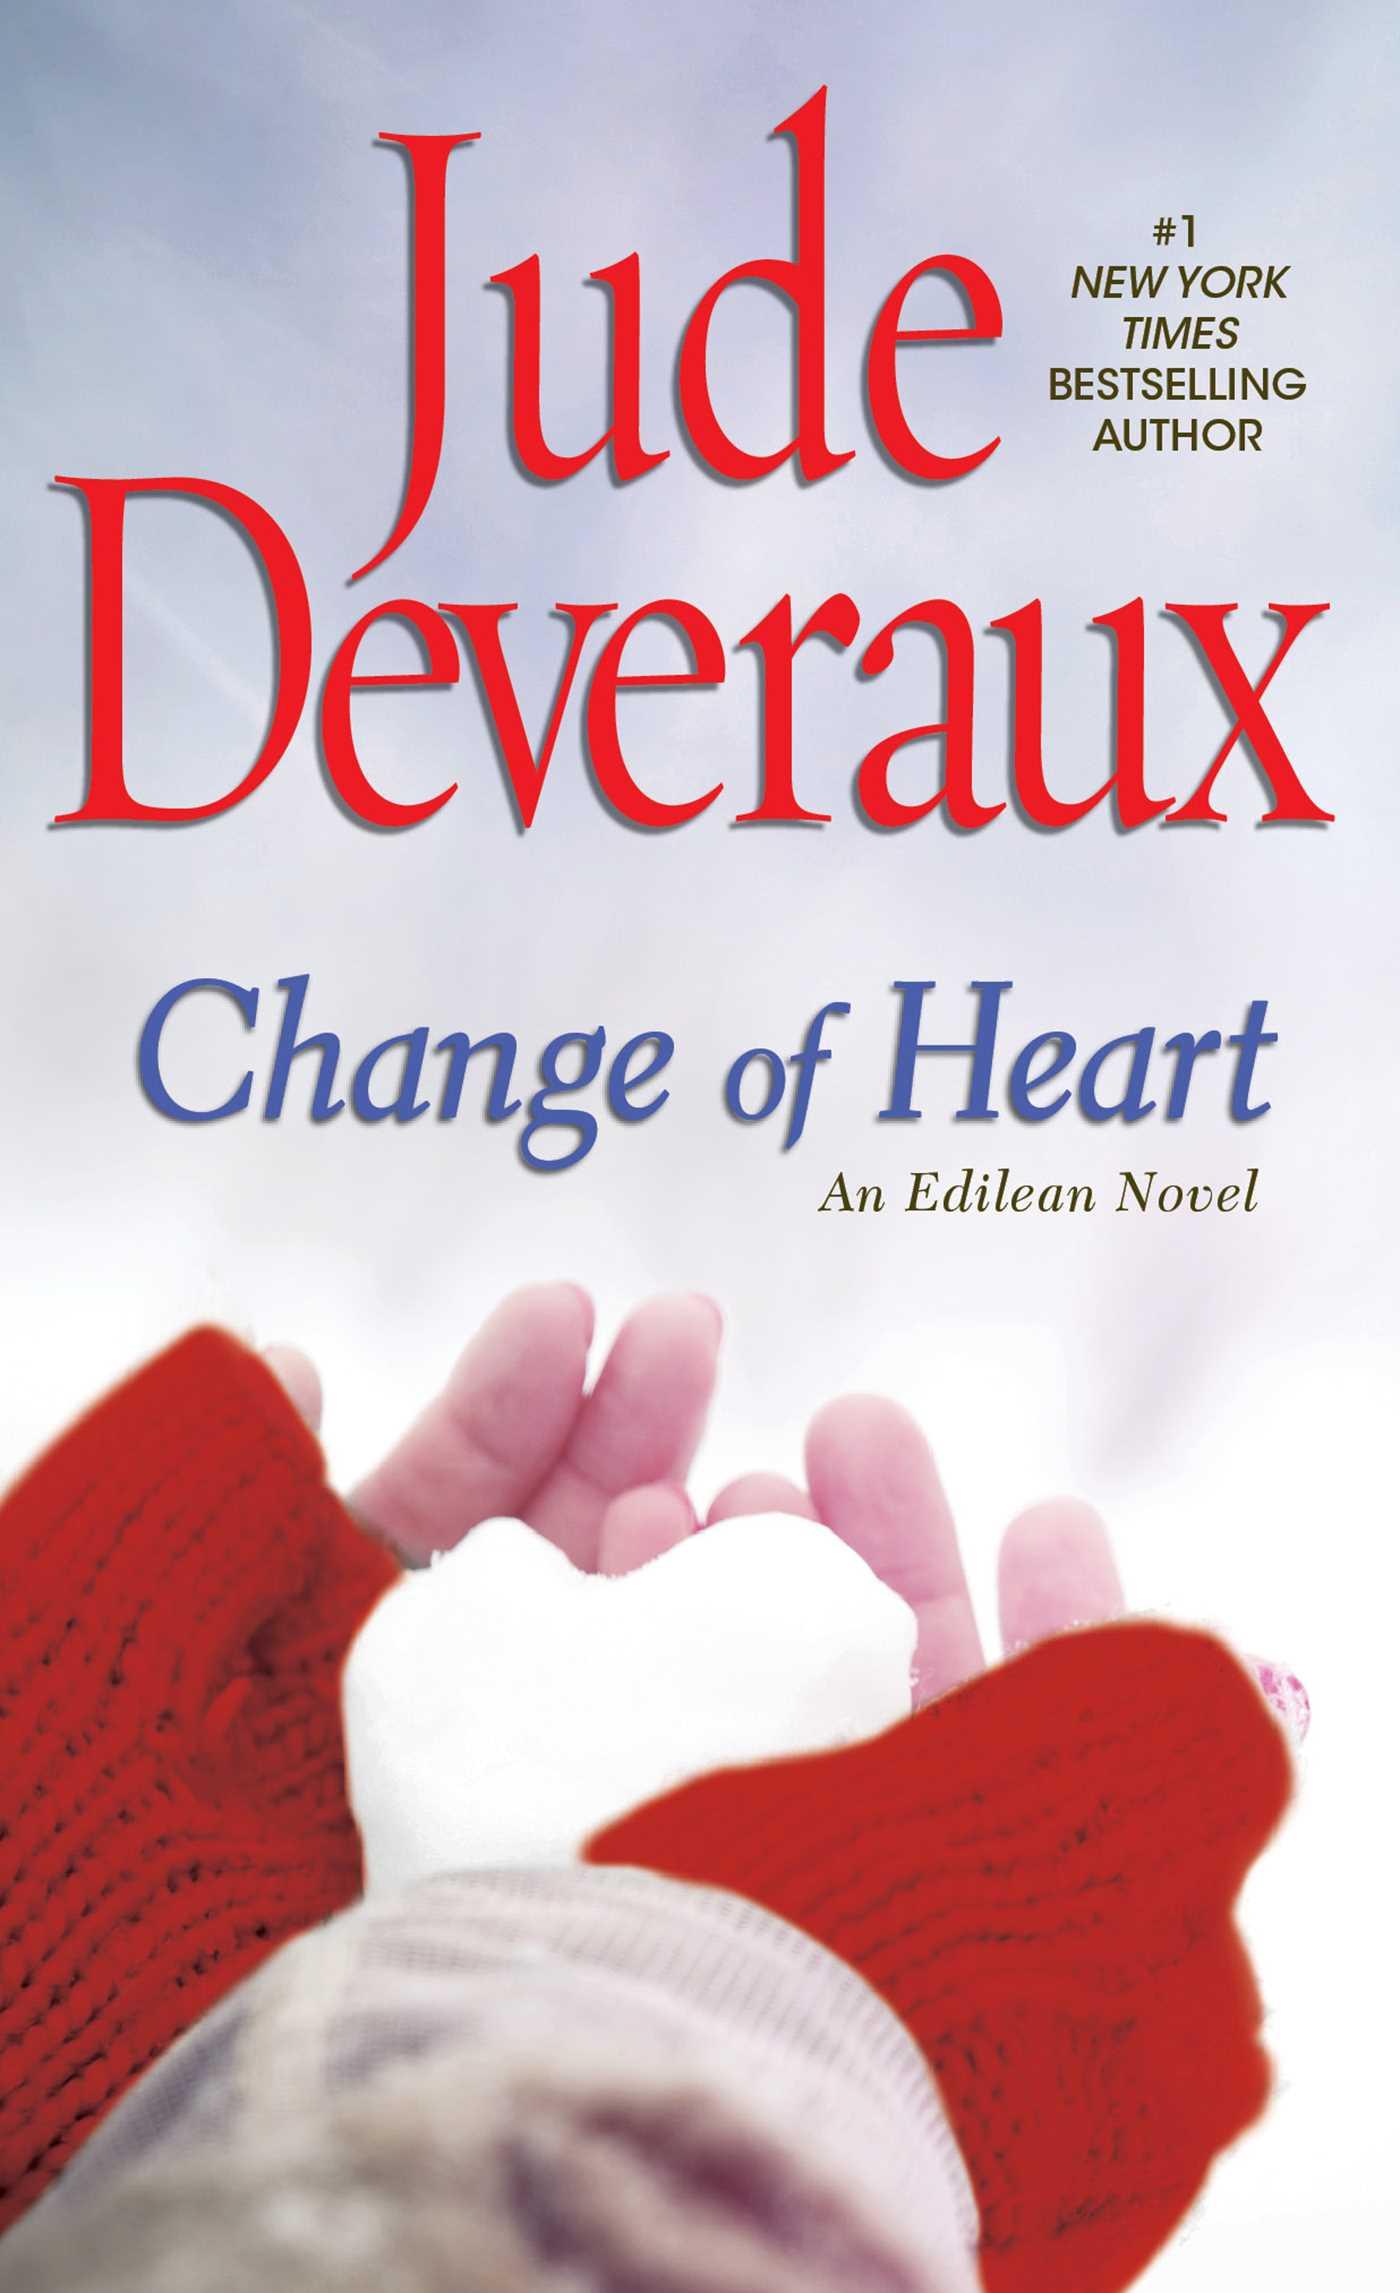 Change of heart 9781476779737 hr